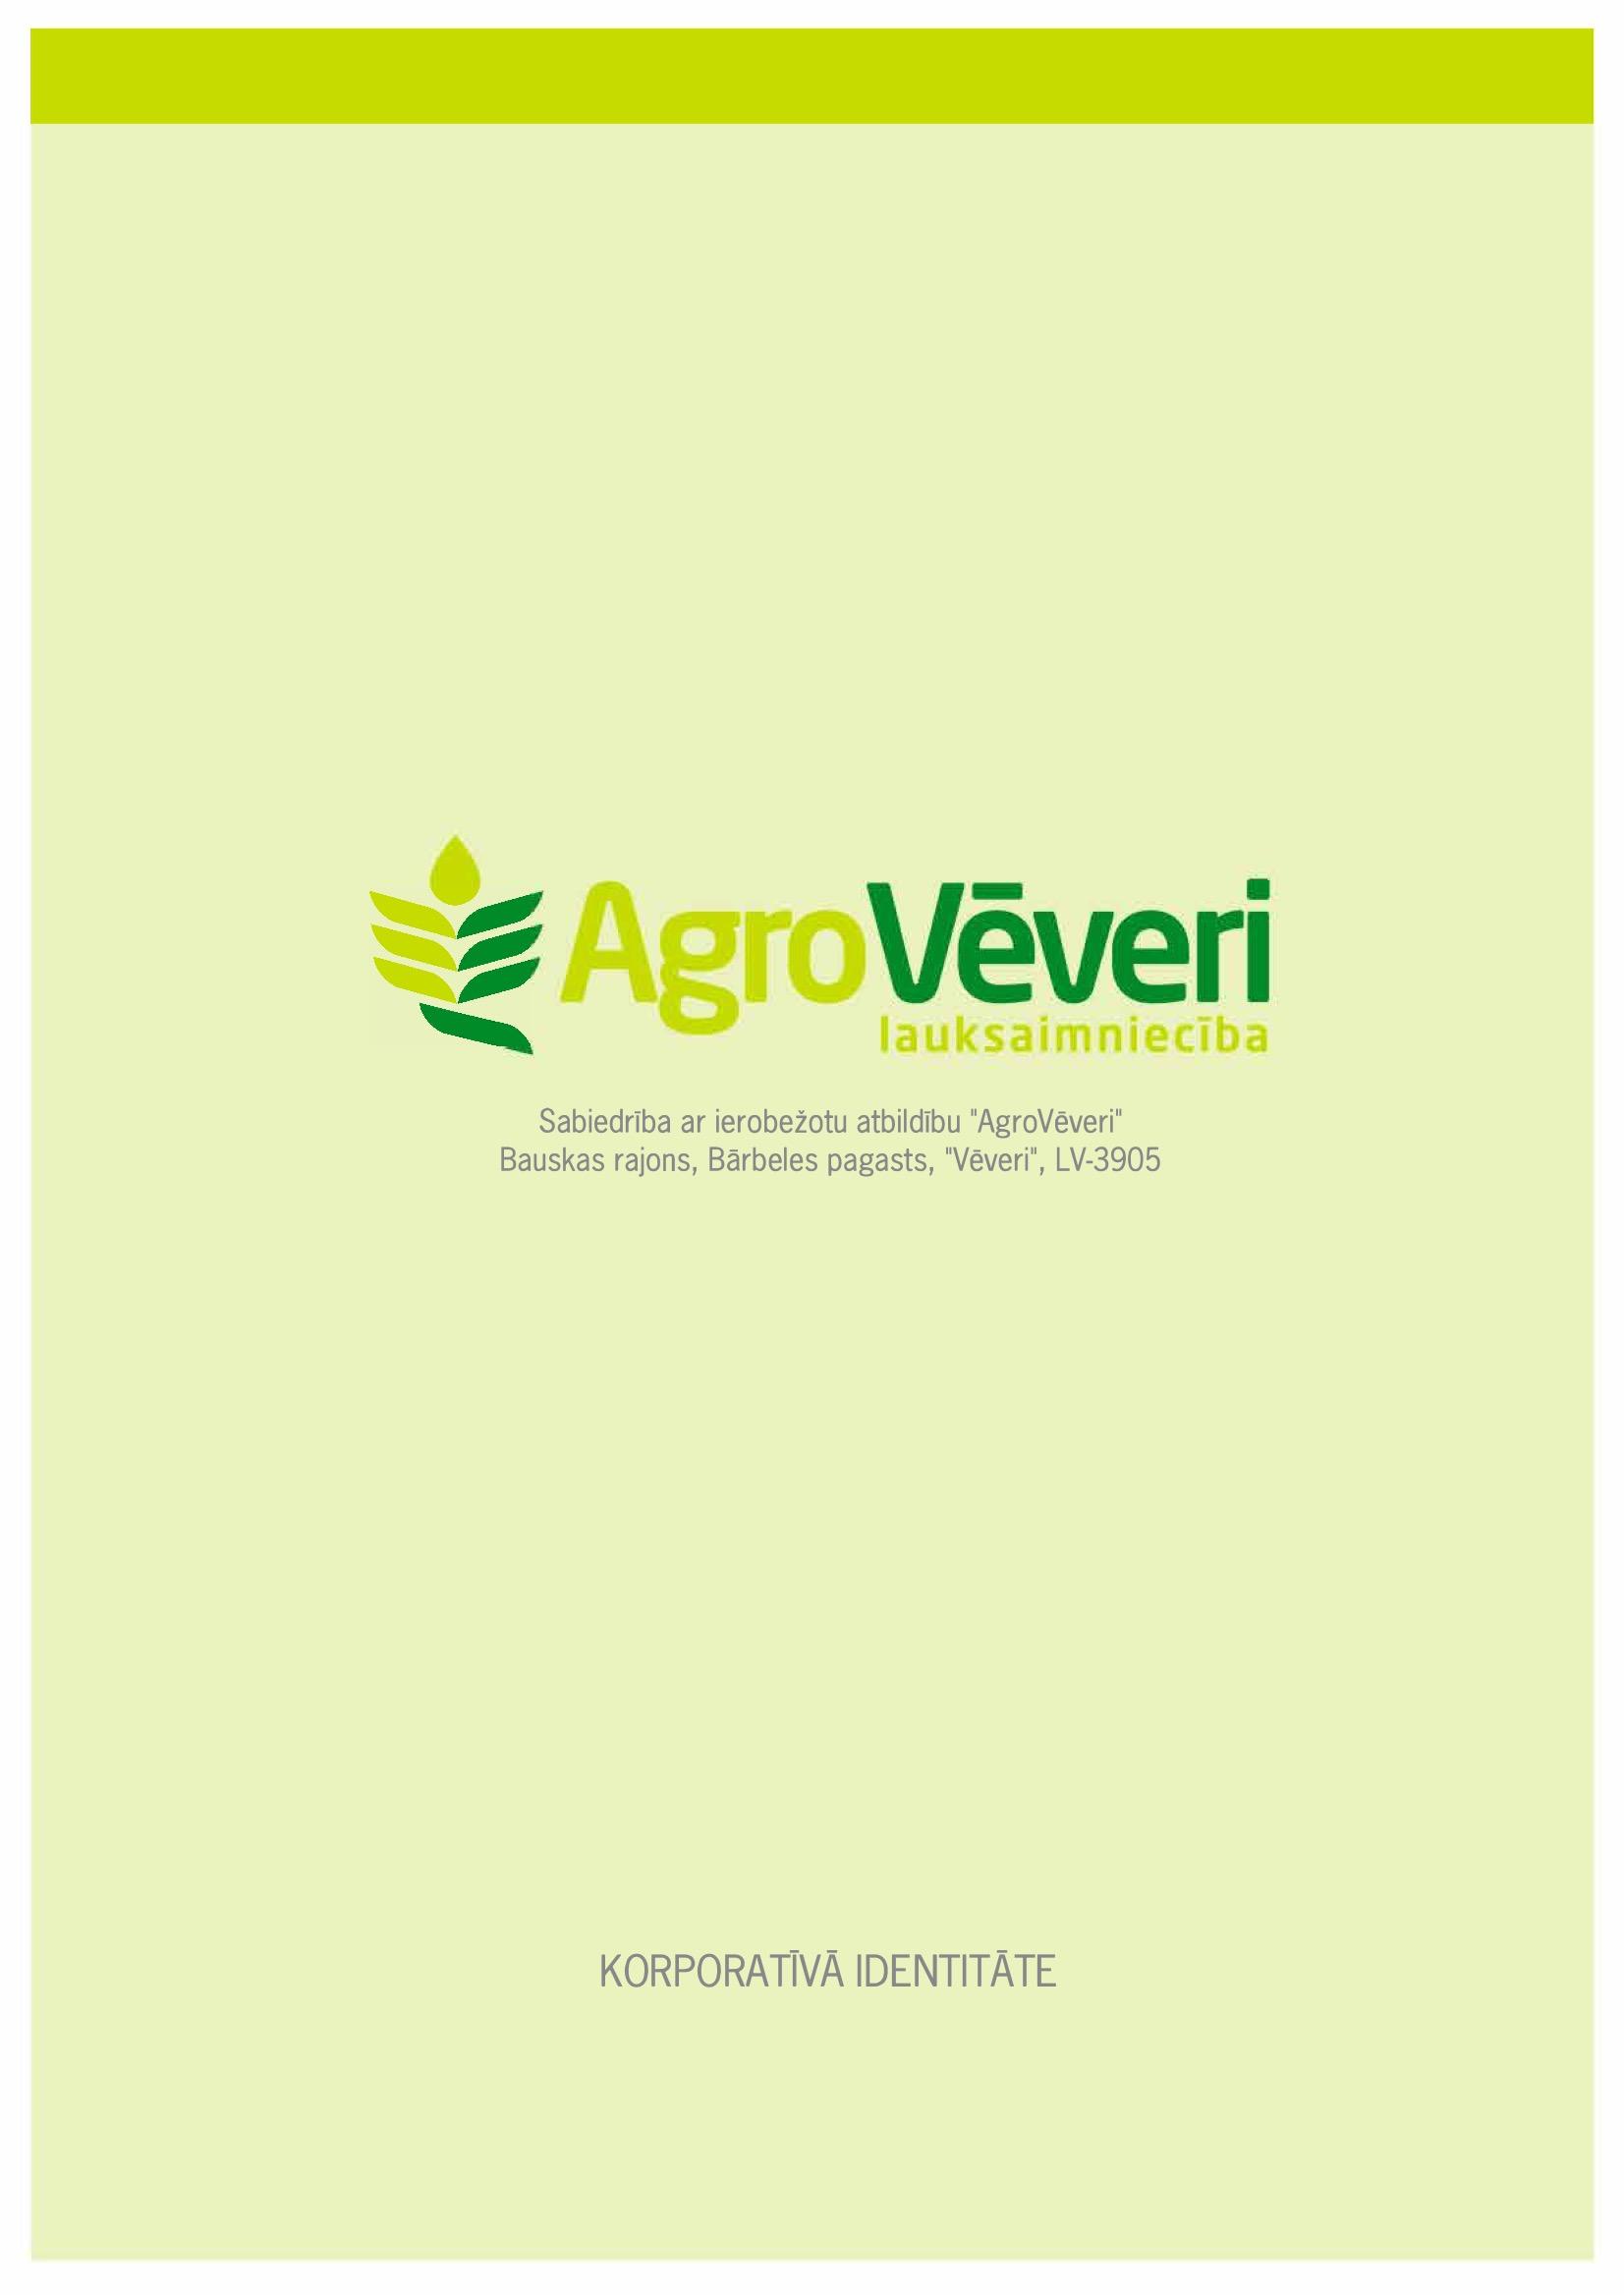 Agroveveri_Stils 1